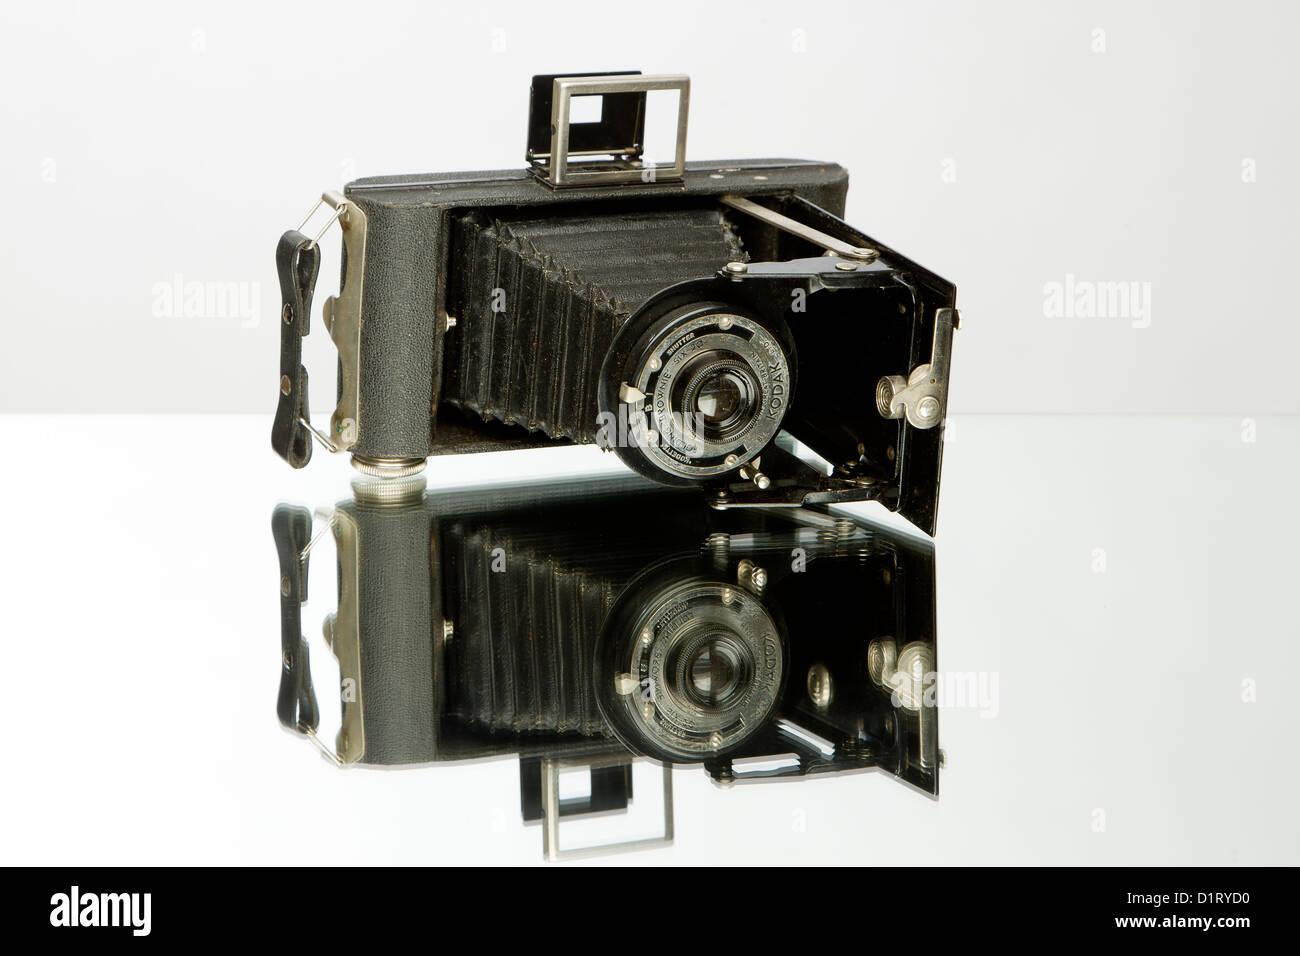 Kodak Six-20 Folding Brownie - Stock Image